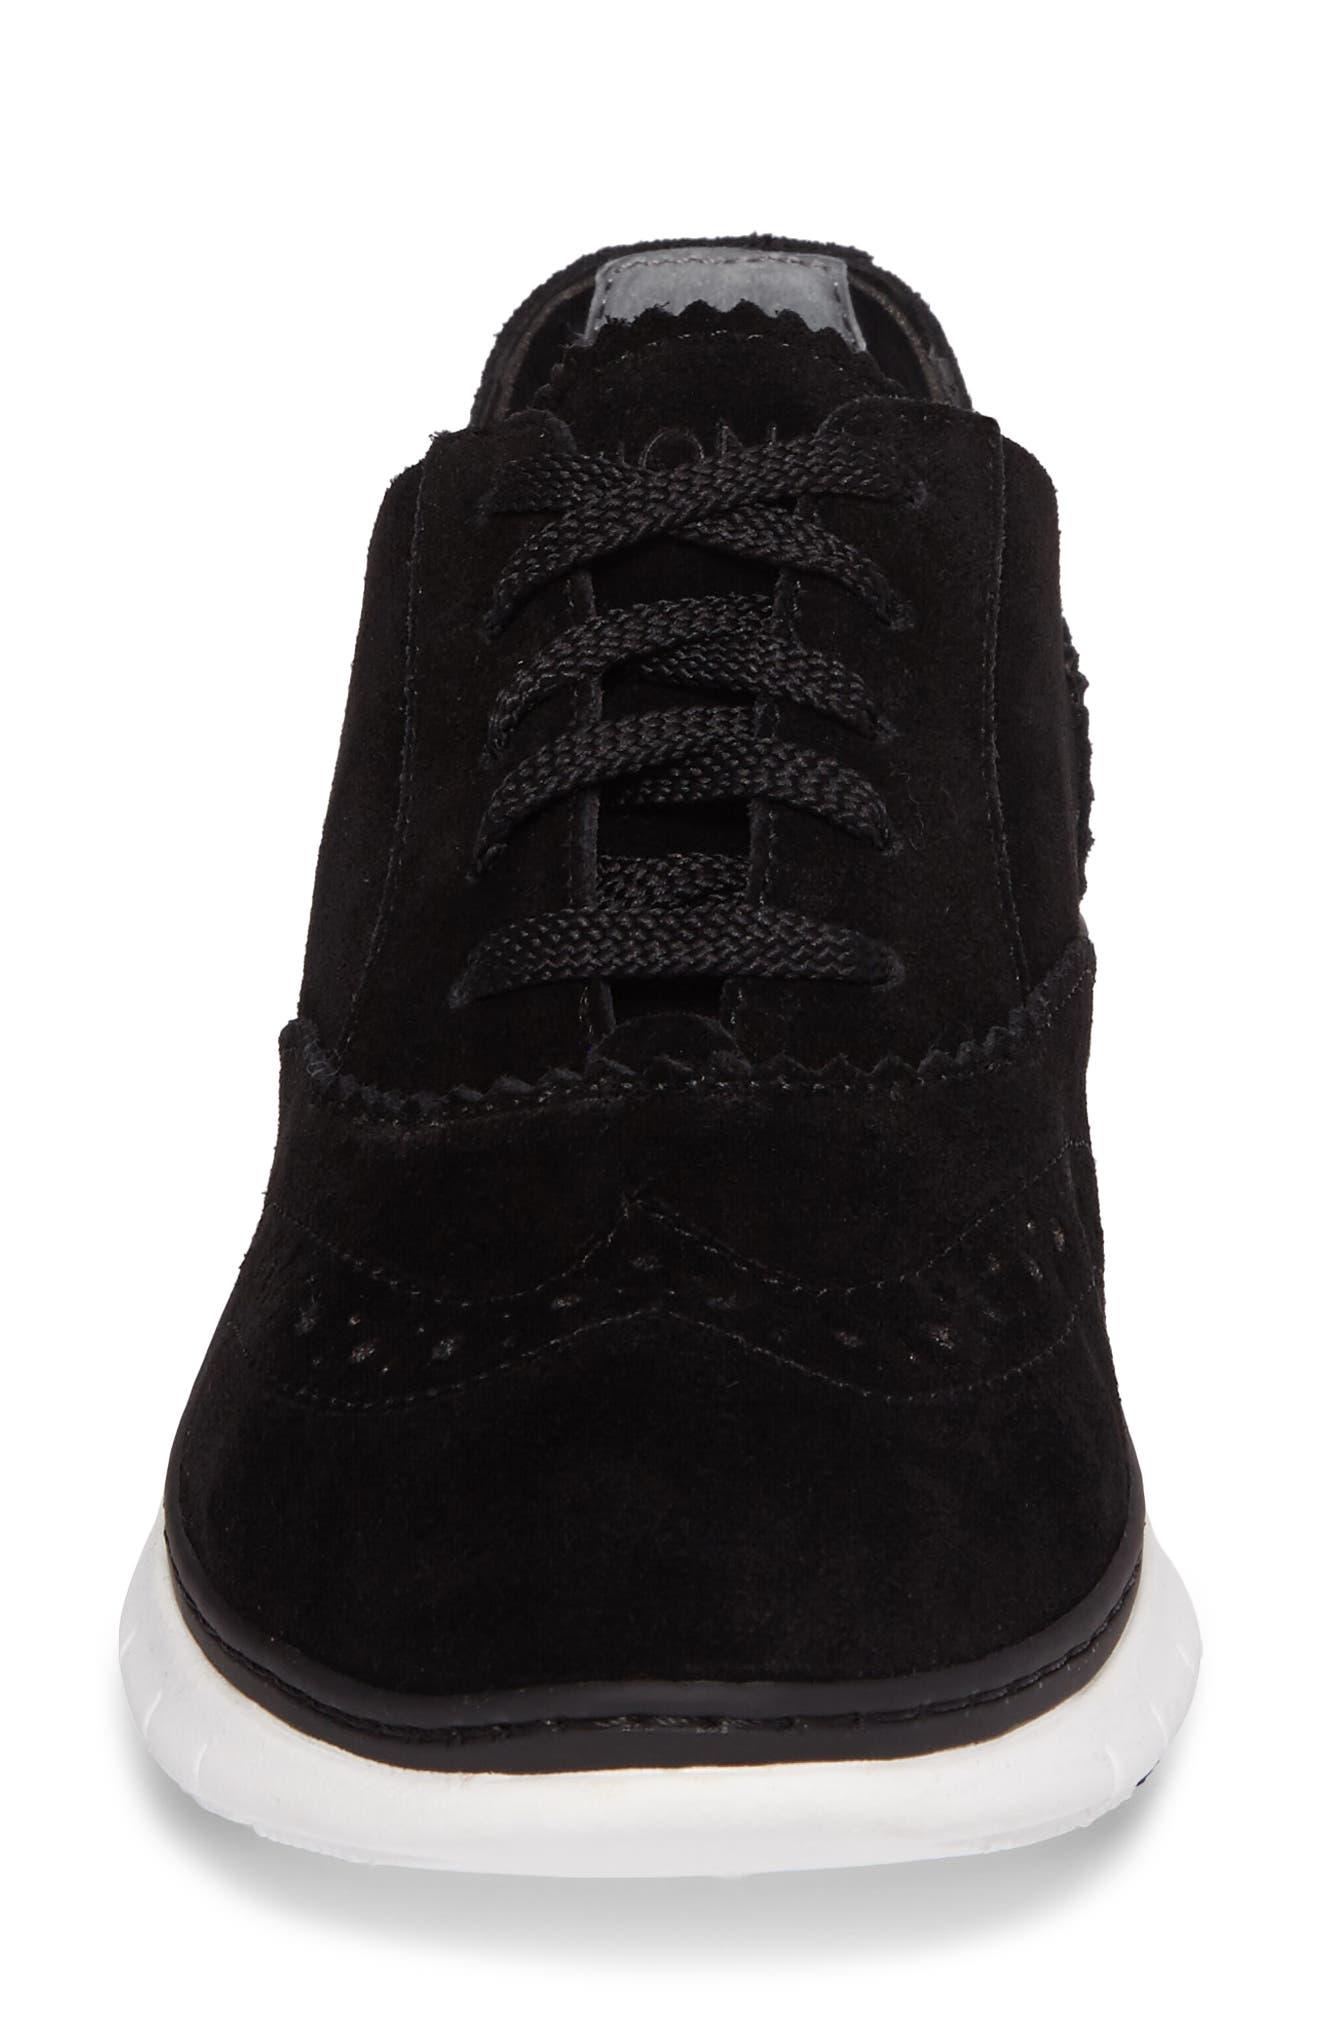 Kenley Sneaker,                             Alternate thumbnail 4, color,                             Black Suede